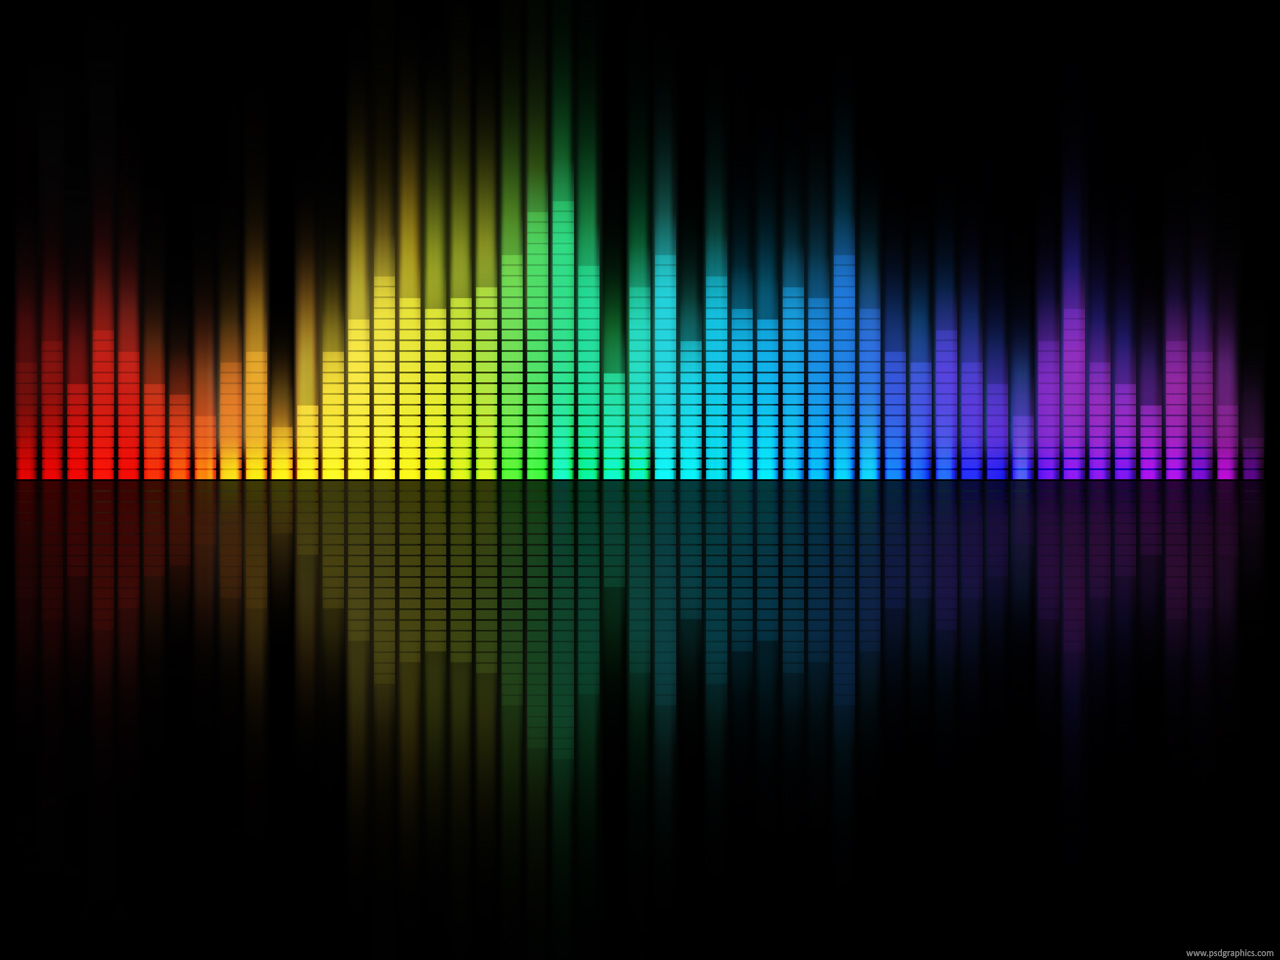 music background image wallpapersafari